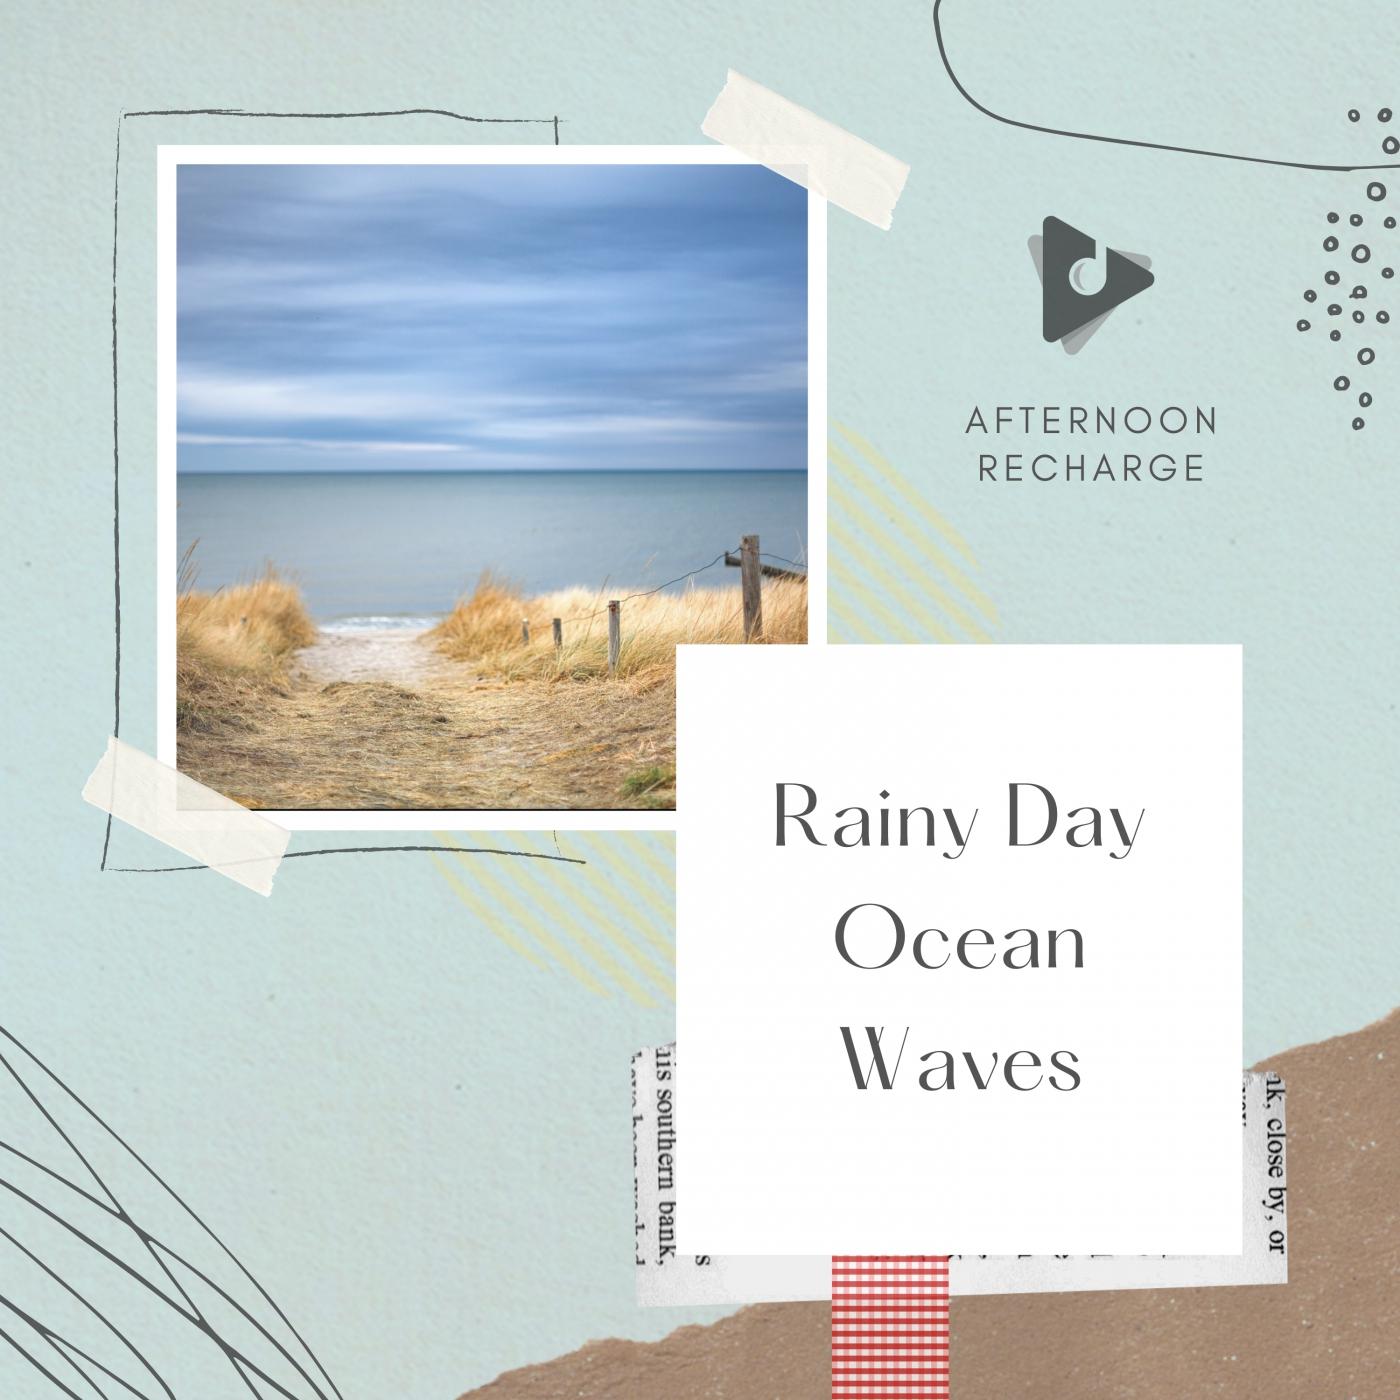 Rainy Day Ocean Waves